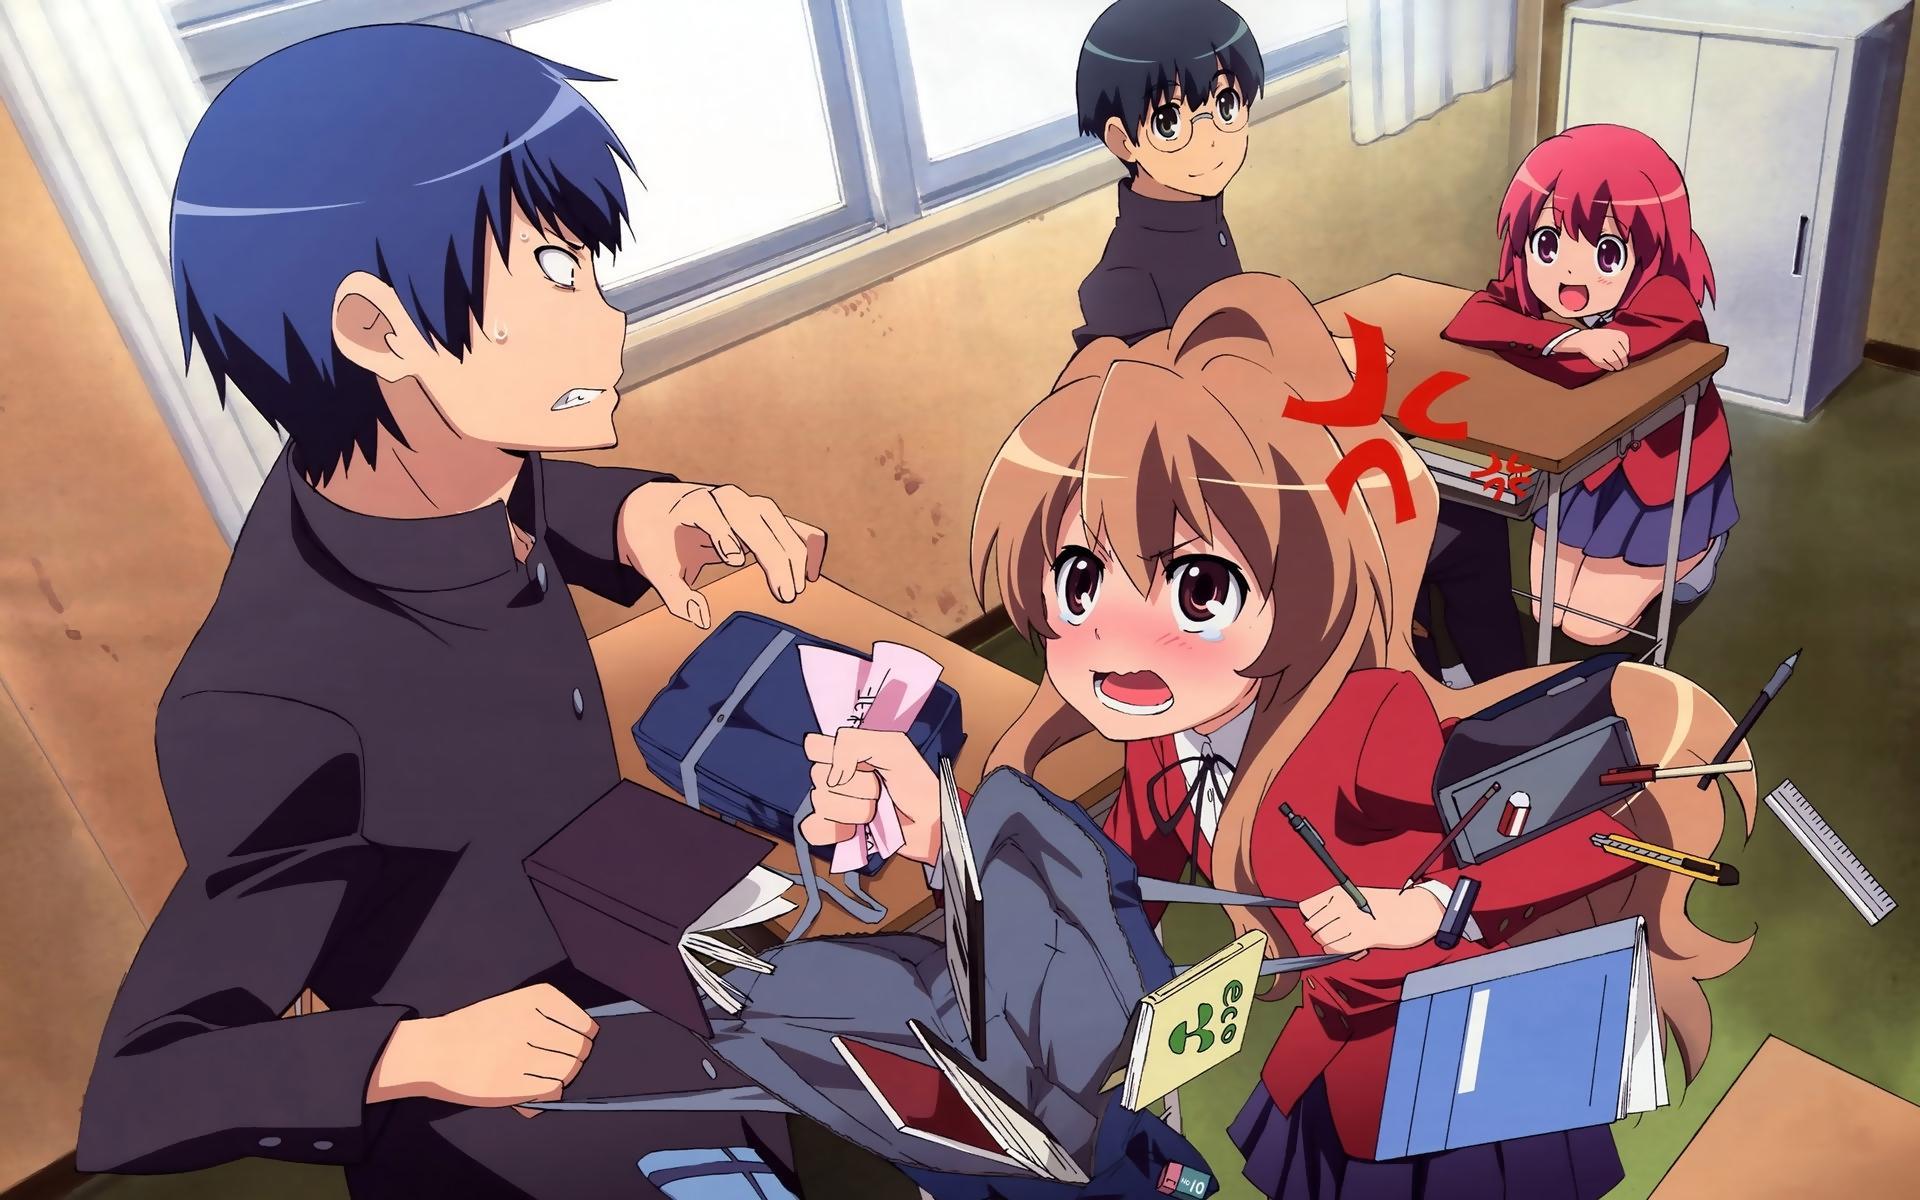 http://anime-comic.blog.so-net.ne.jp/_images/blog/_240/anime-comic/toradora12.jpg